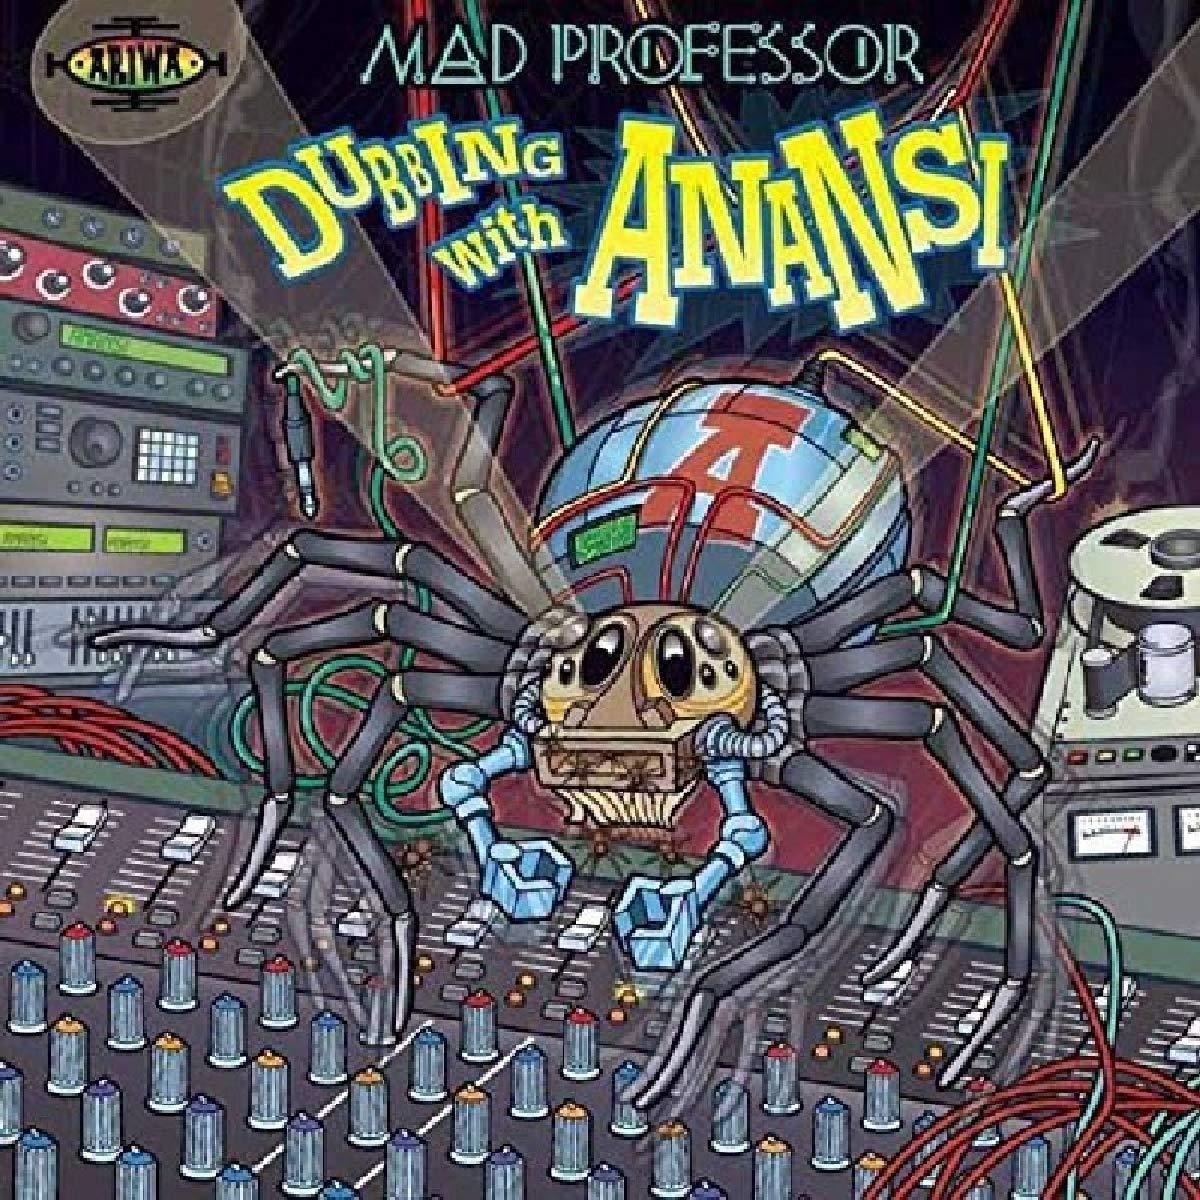 Mad Professor - Dubbing With Anansi